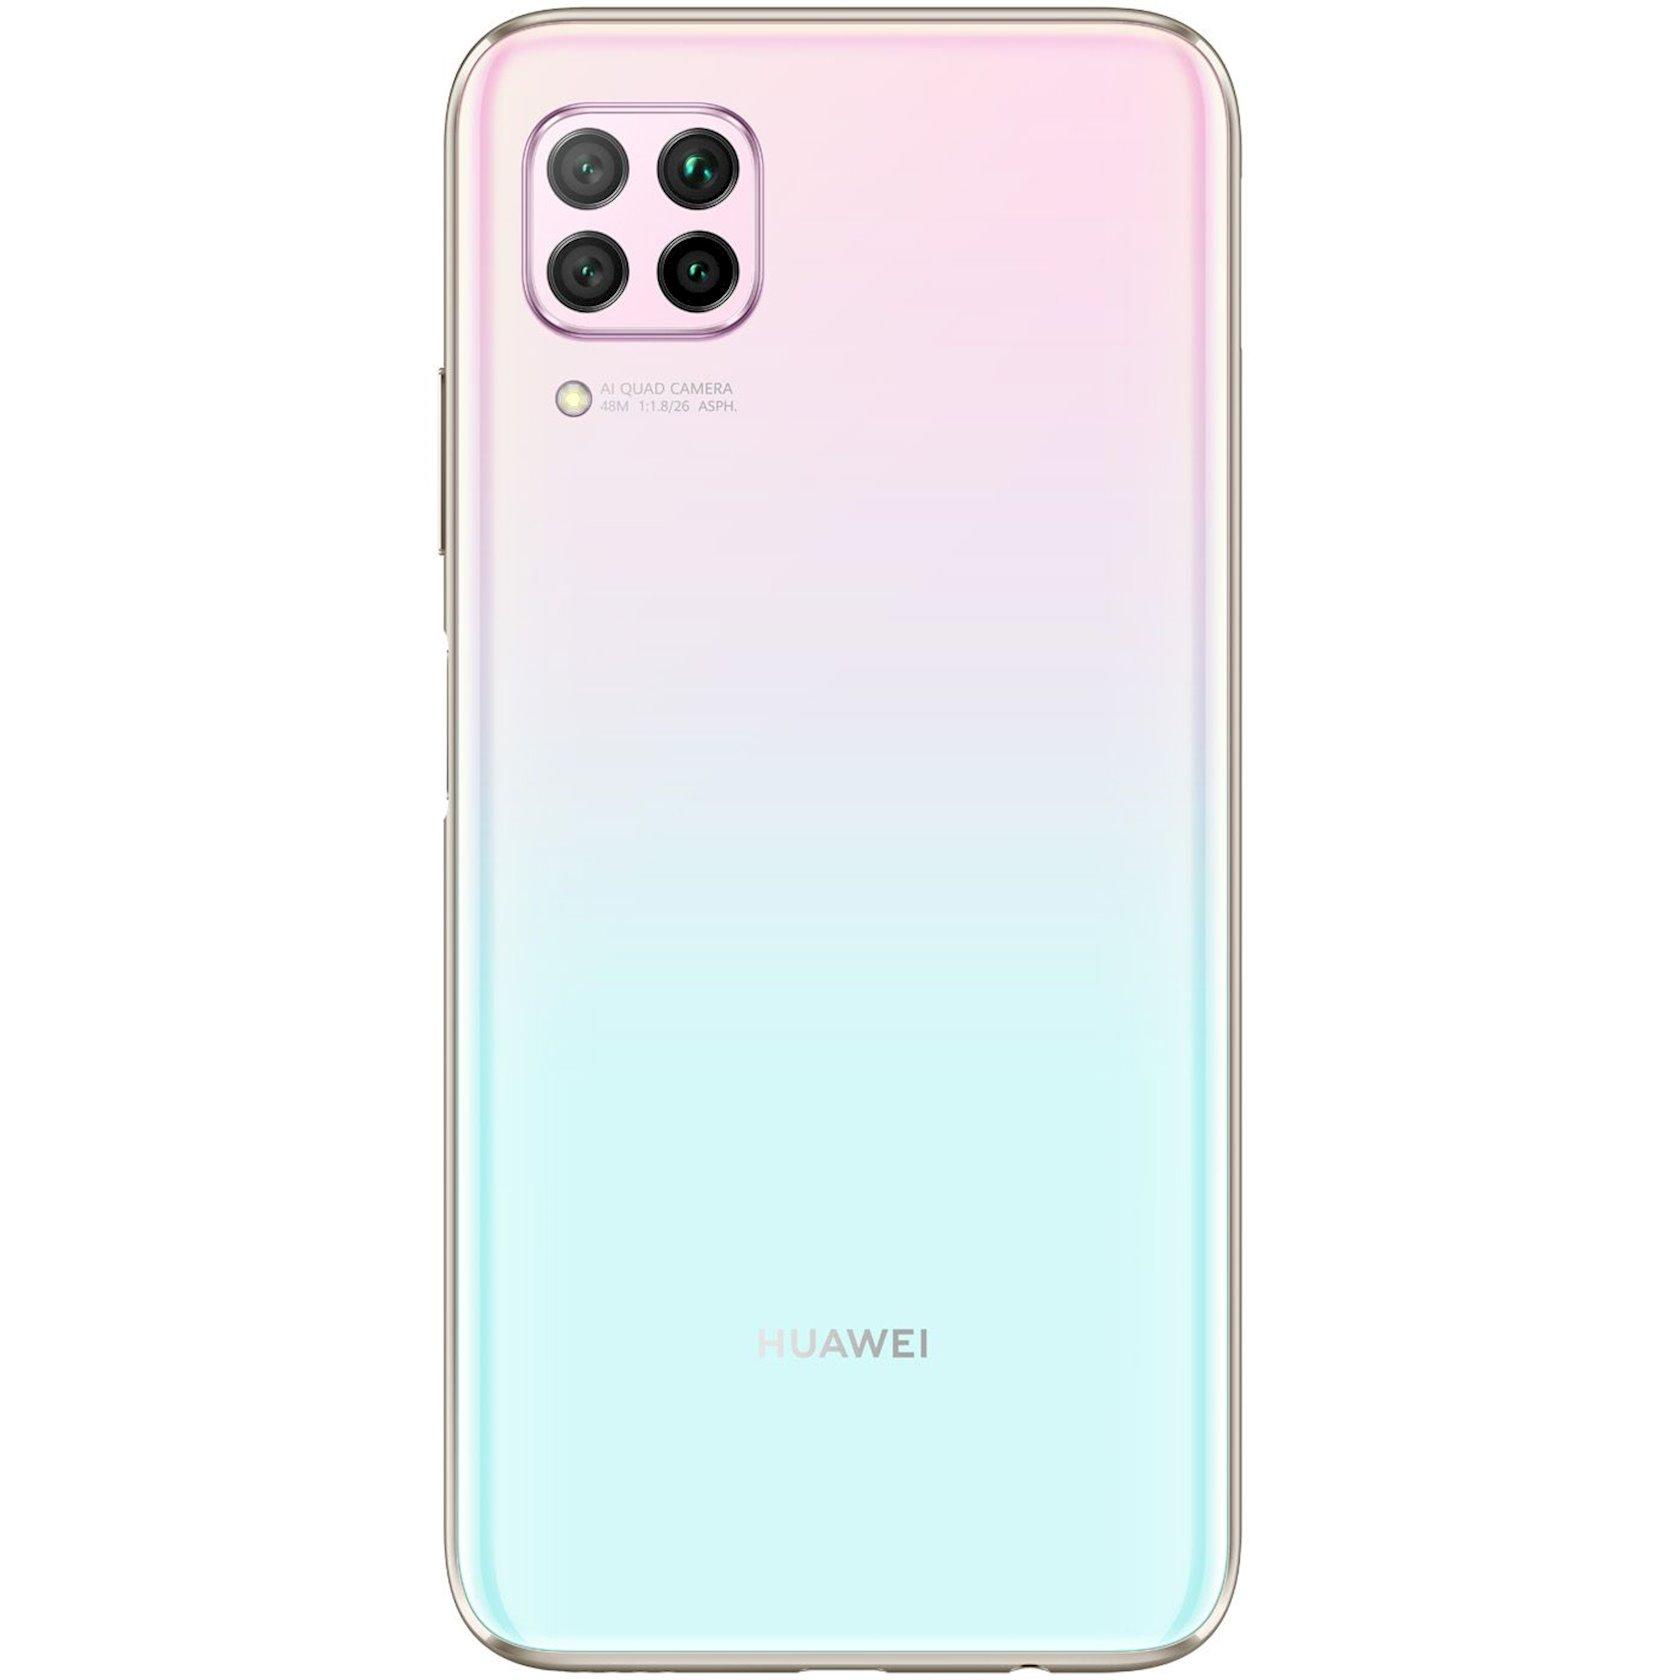 Smartfon Huawei P40 lite 6GB/128GB Light Pink